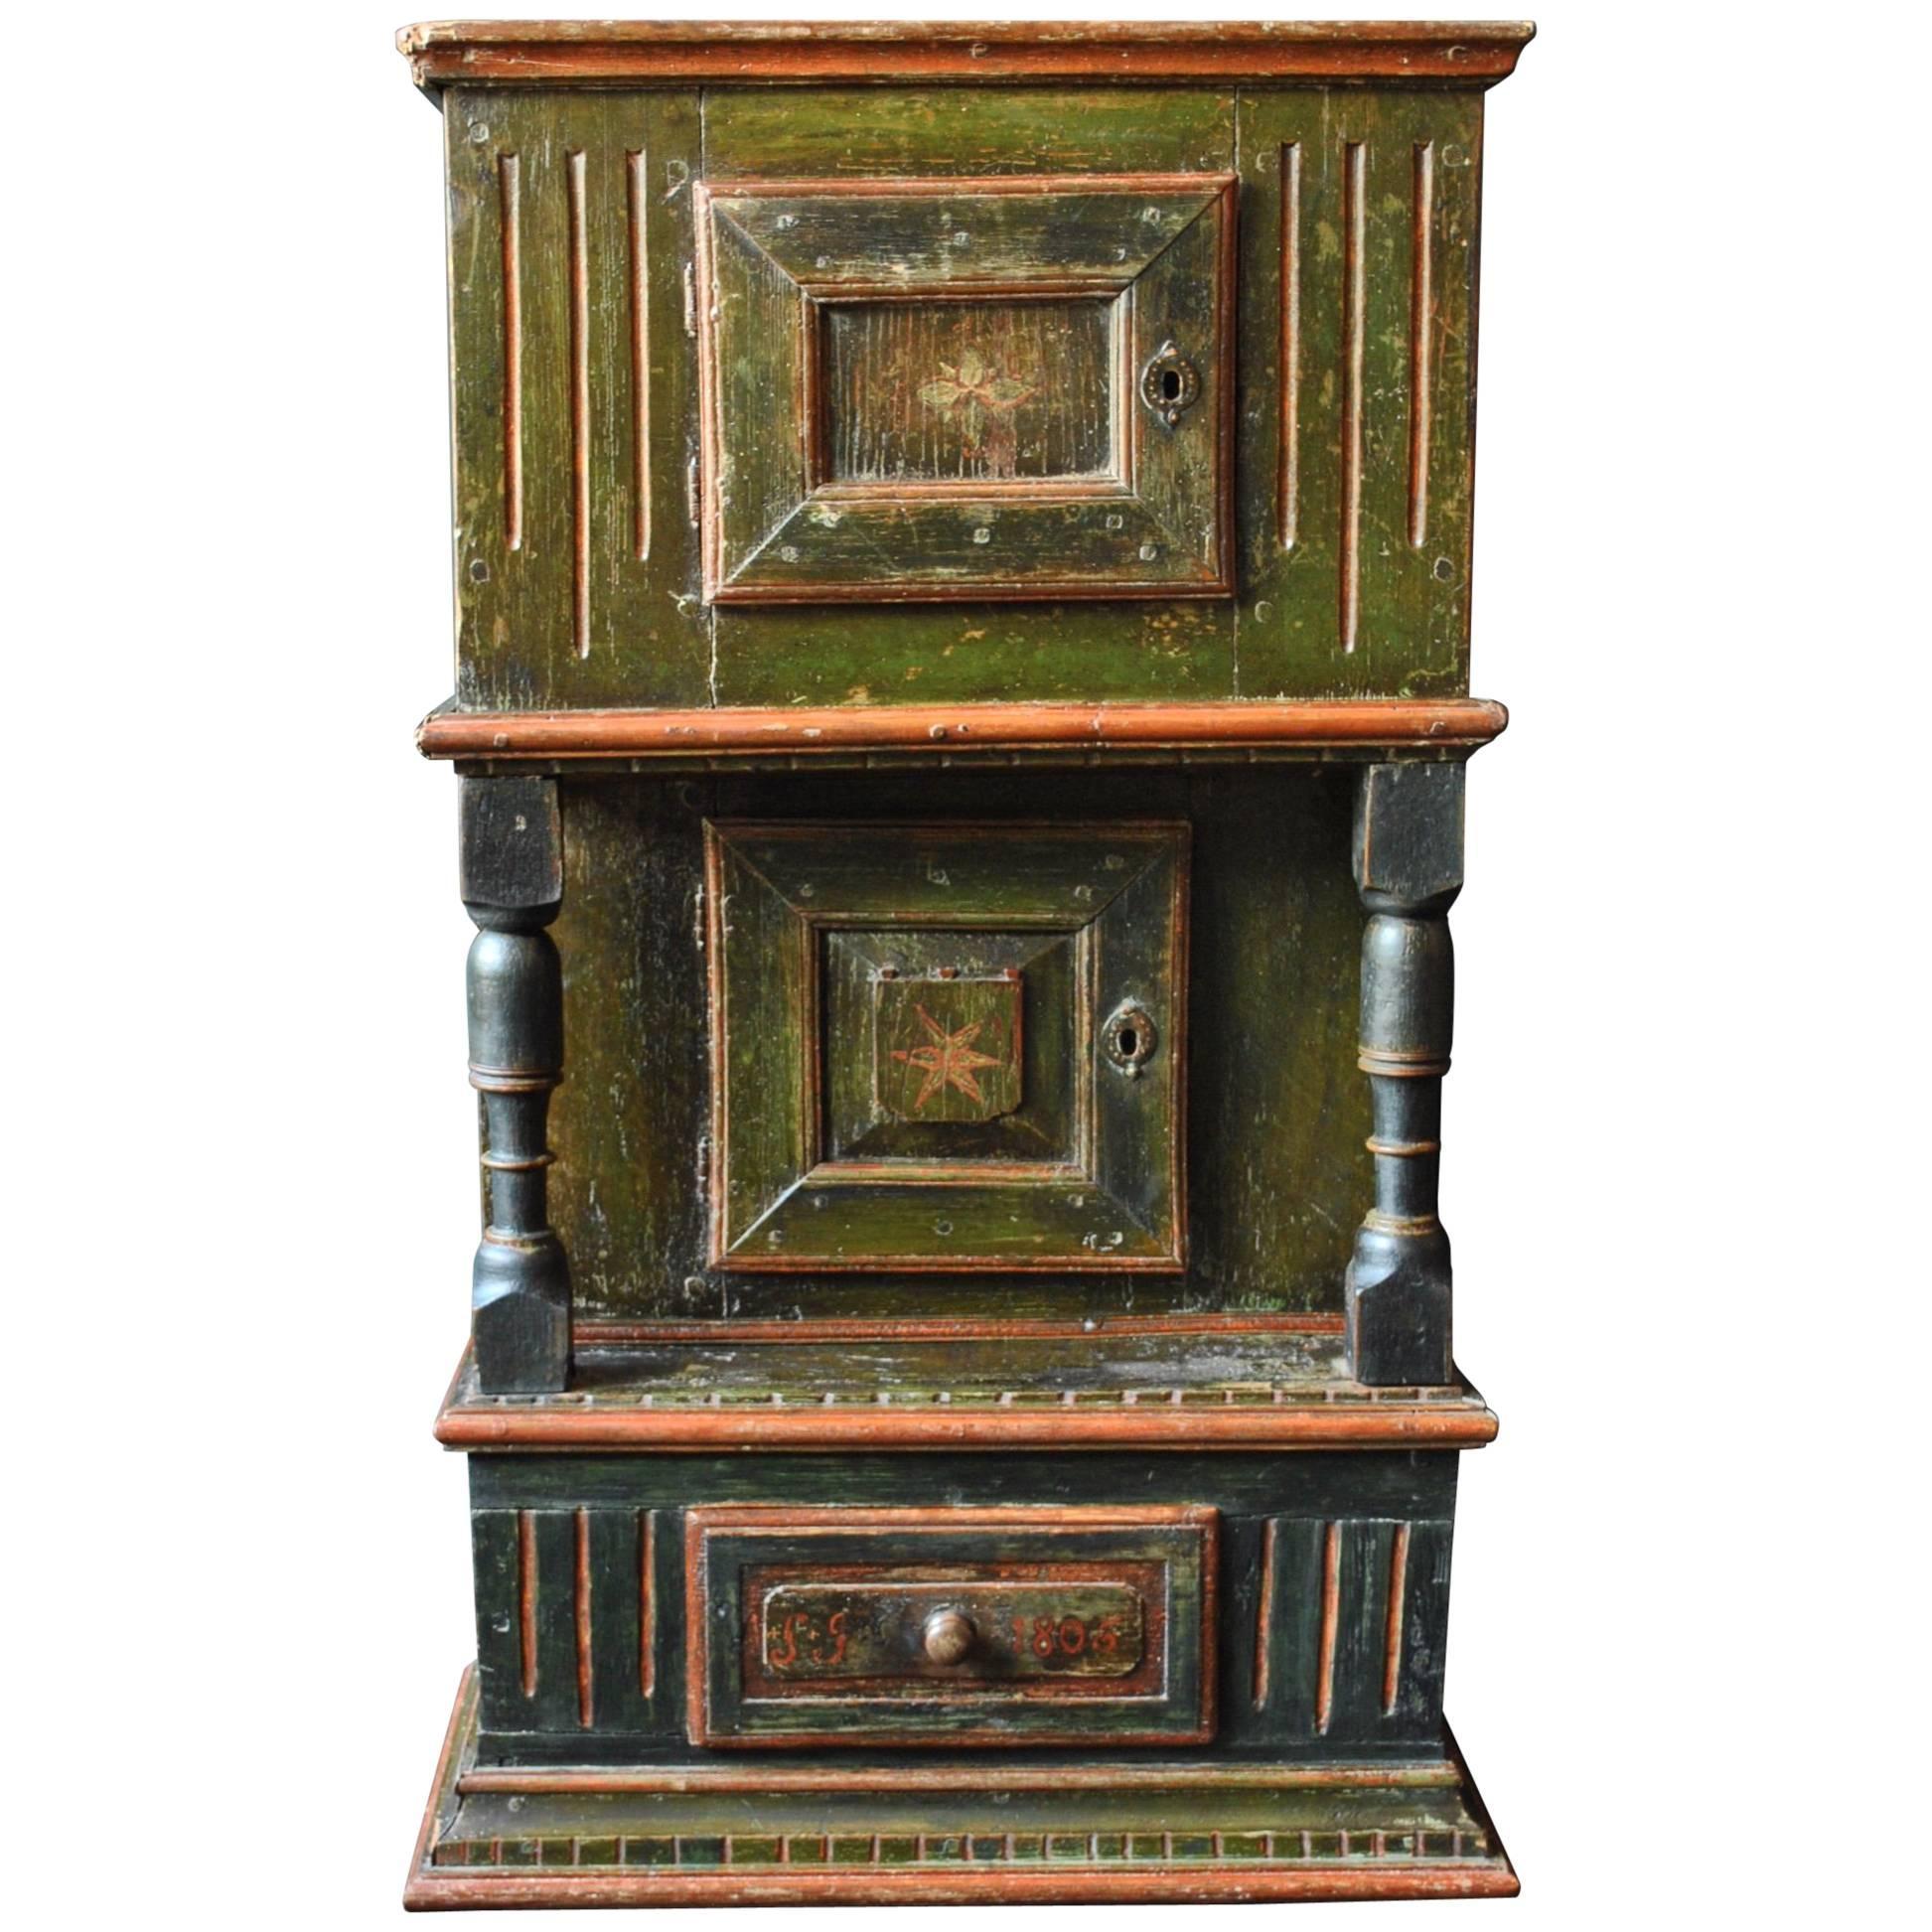 Delicieux Antique Scandinavian Folk Art Painted Gustavian Cabinet, 1806 For Sale